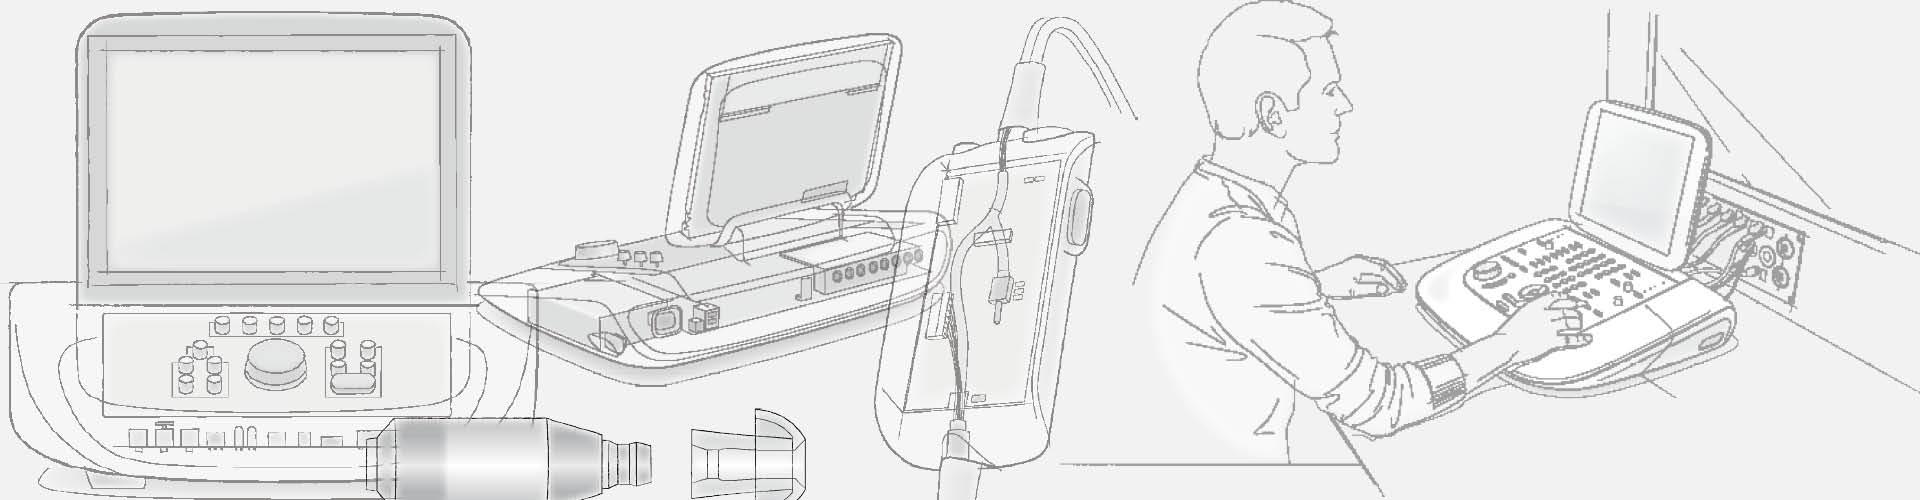 Grason-Stadler Audiometer Tympanometer Designs